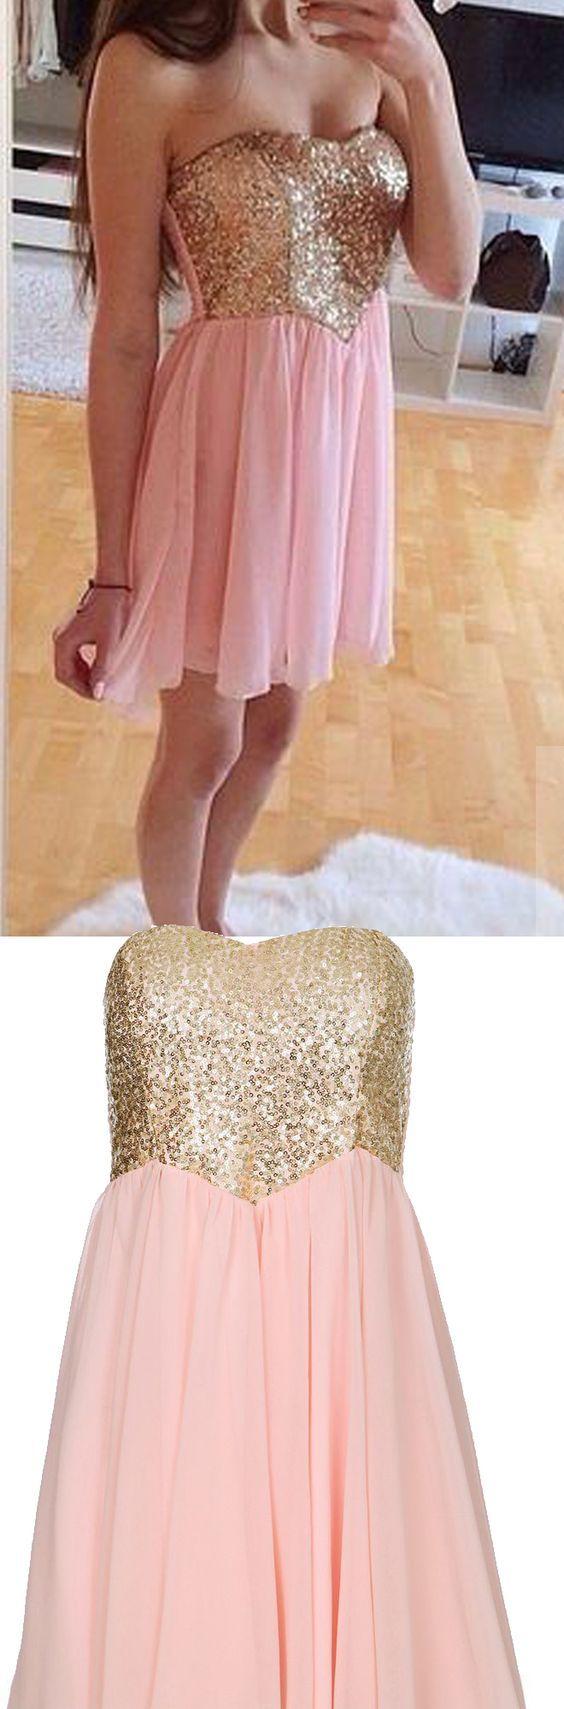 Homecoming Dresses Short Prom Dresses,Pink Homecoming Dresses ...